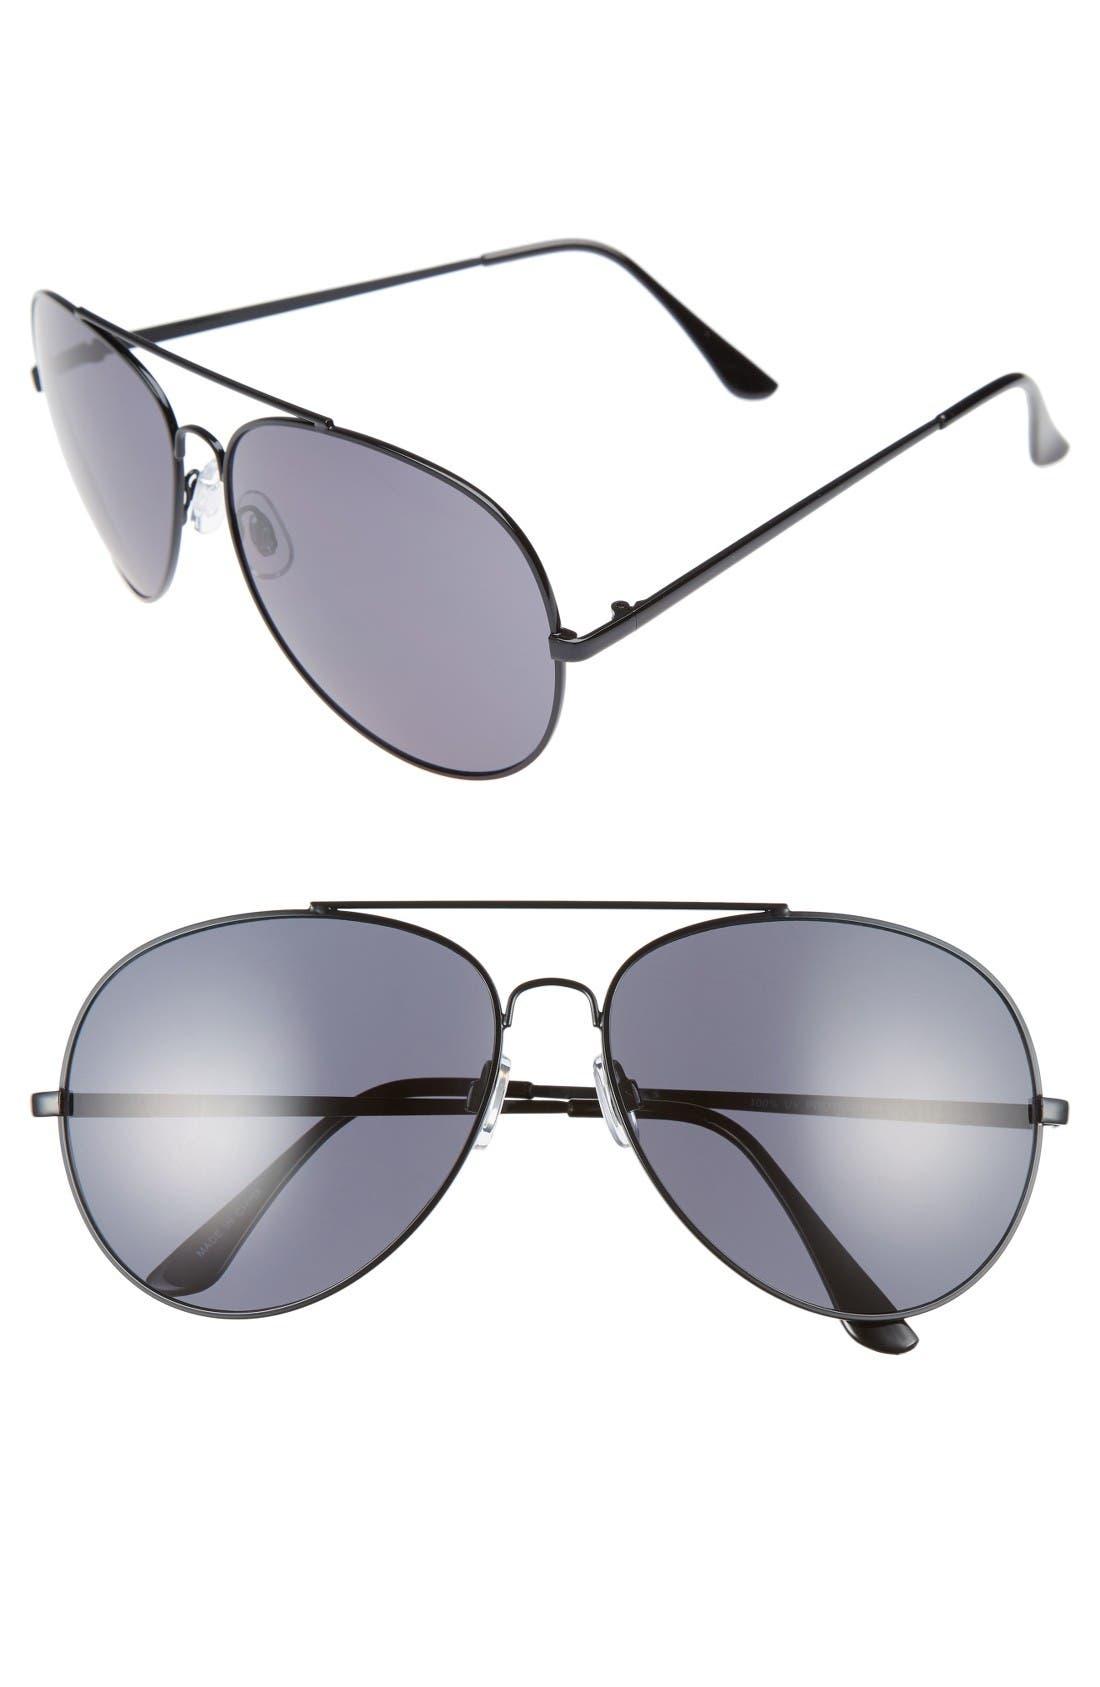 Alternate Image 1 Selected - BP. 65mm Oversize Aviator Sunglasses